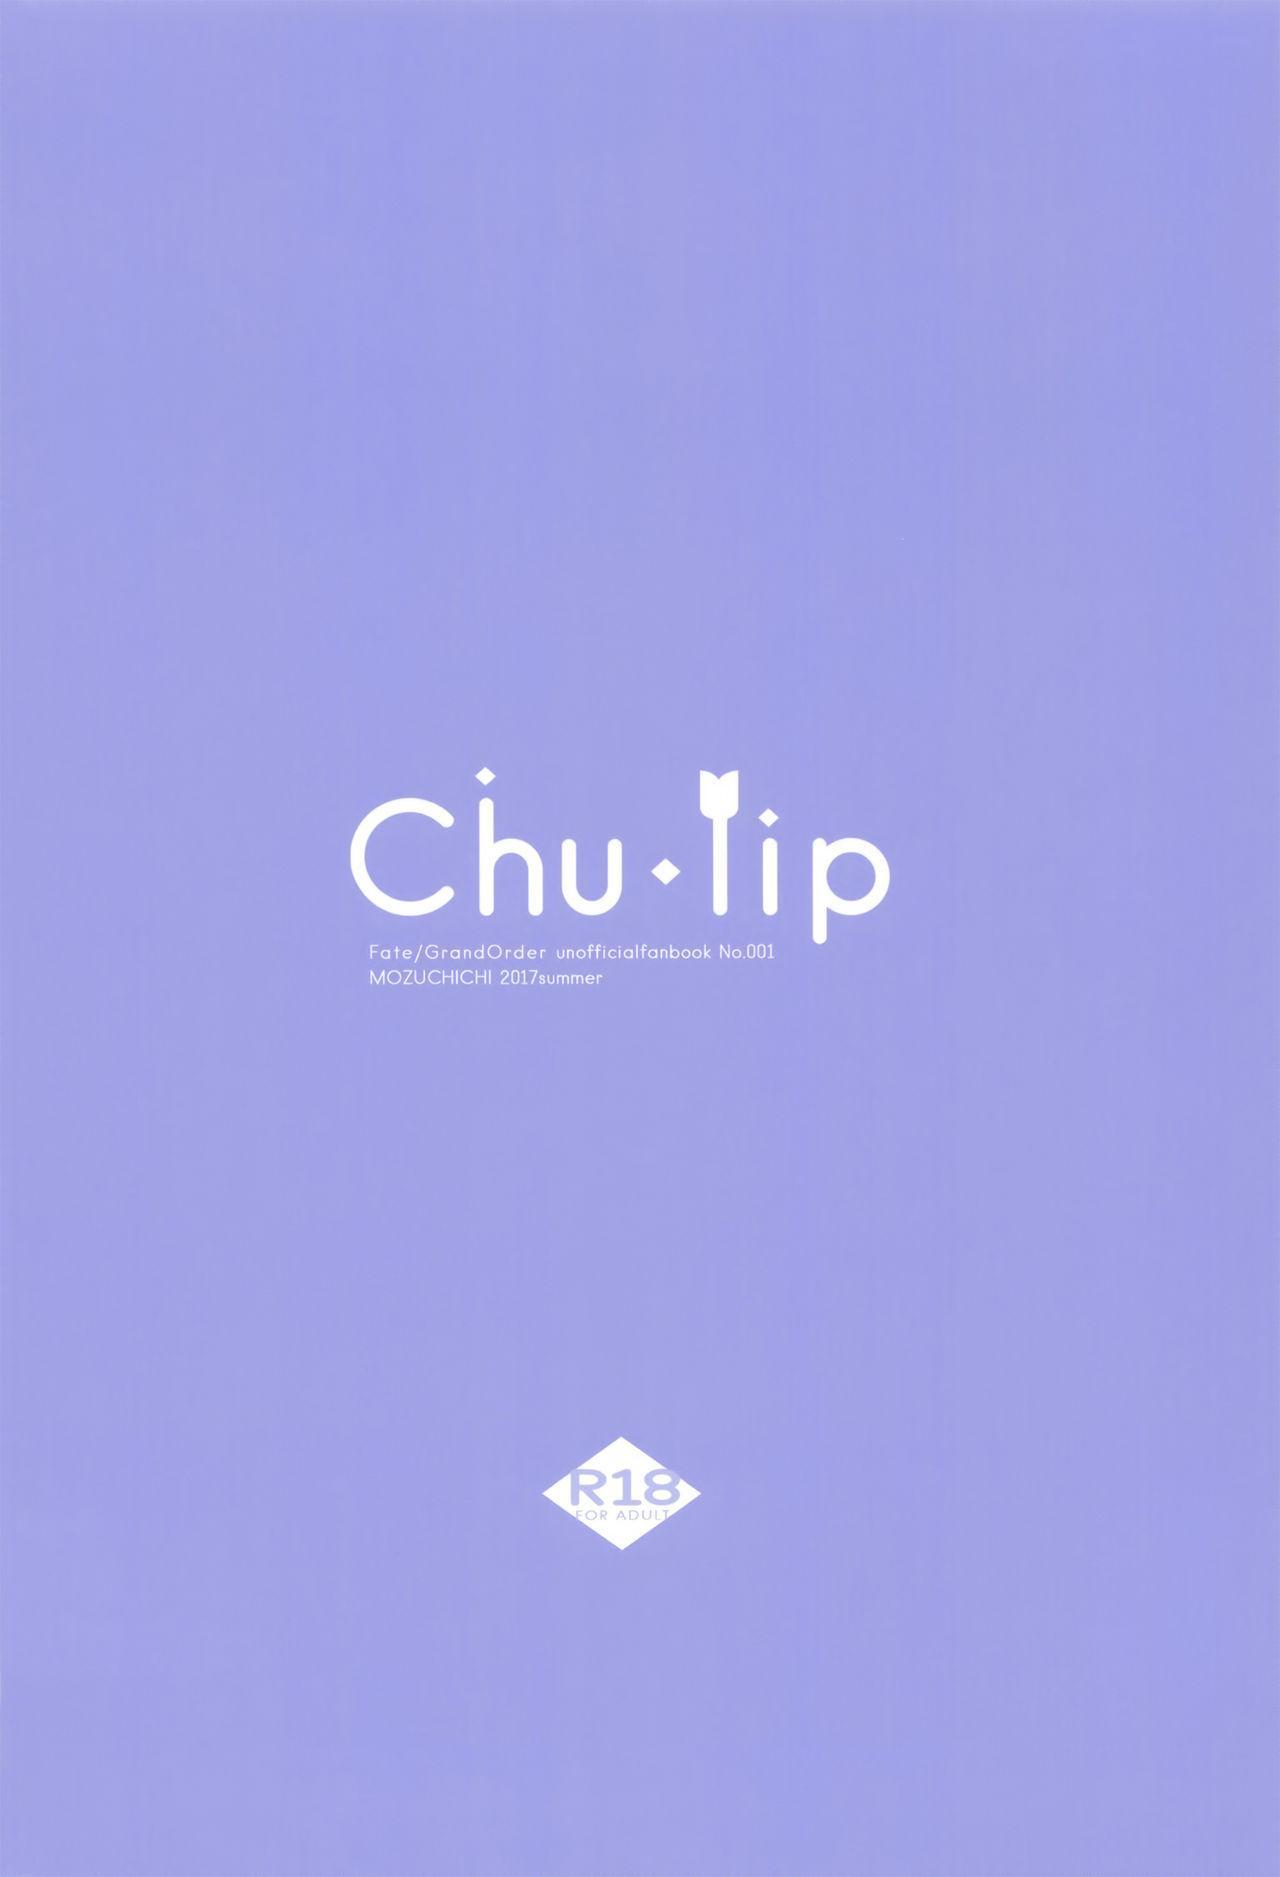 Chu-lip 25